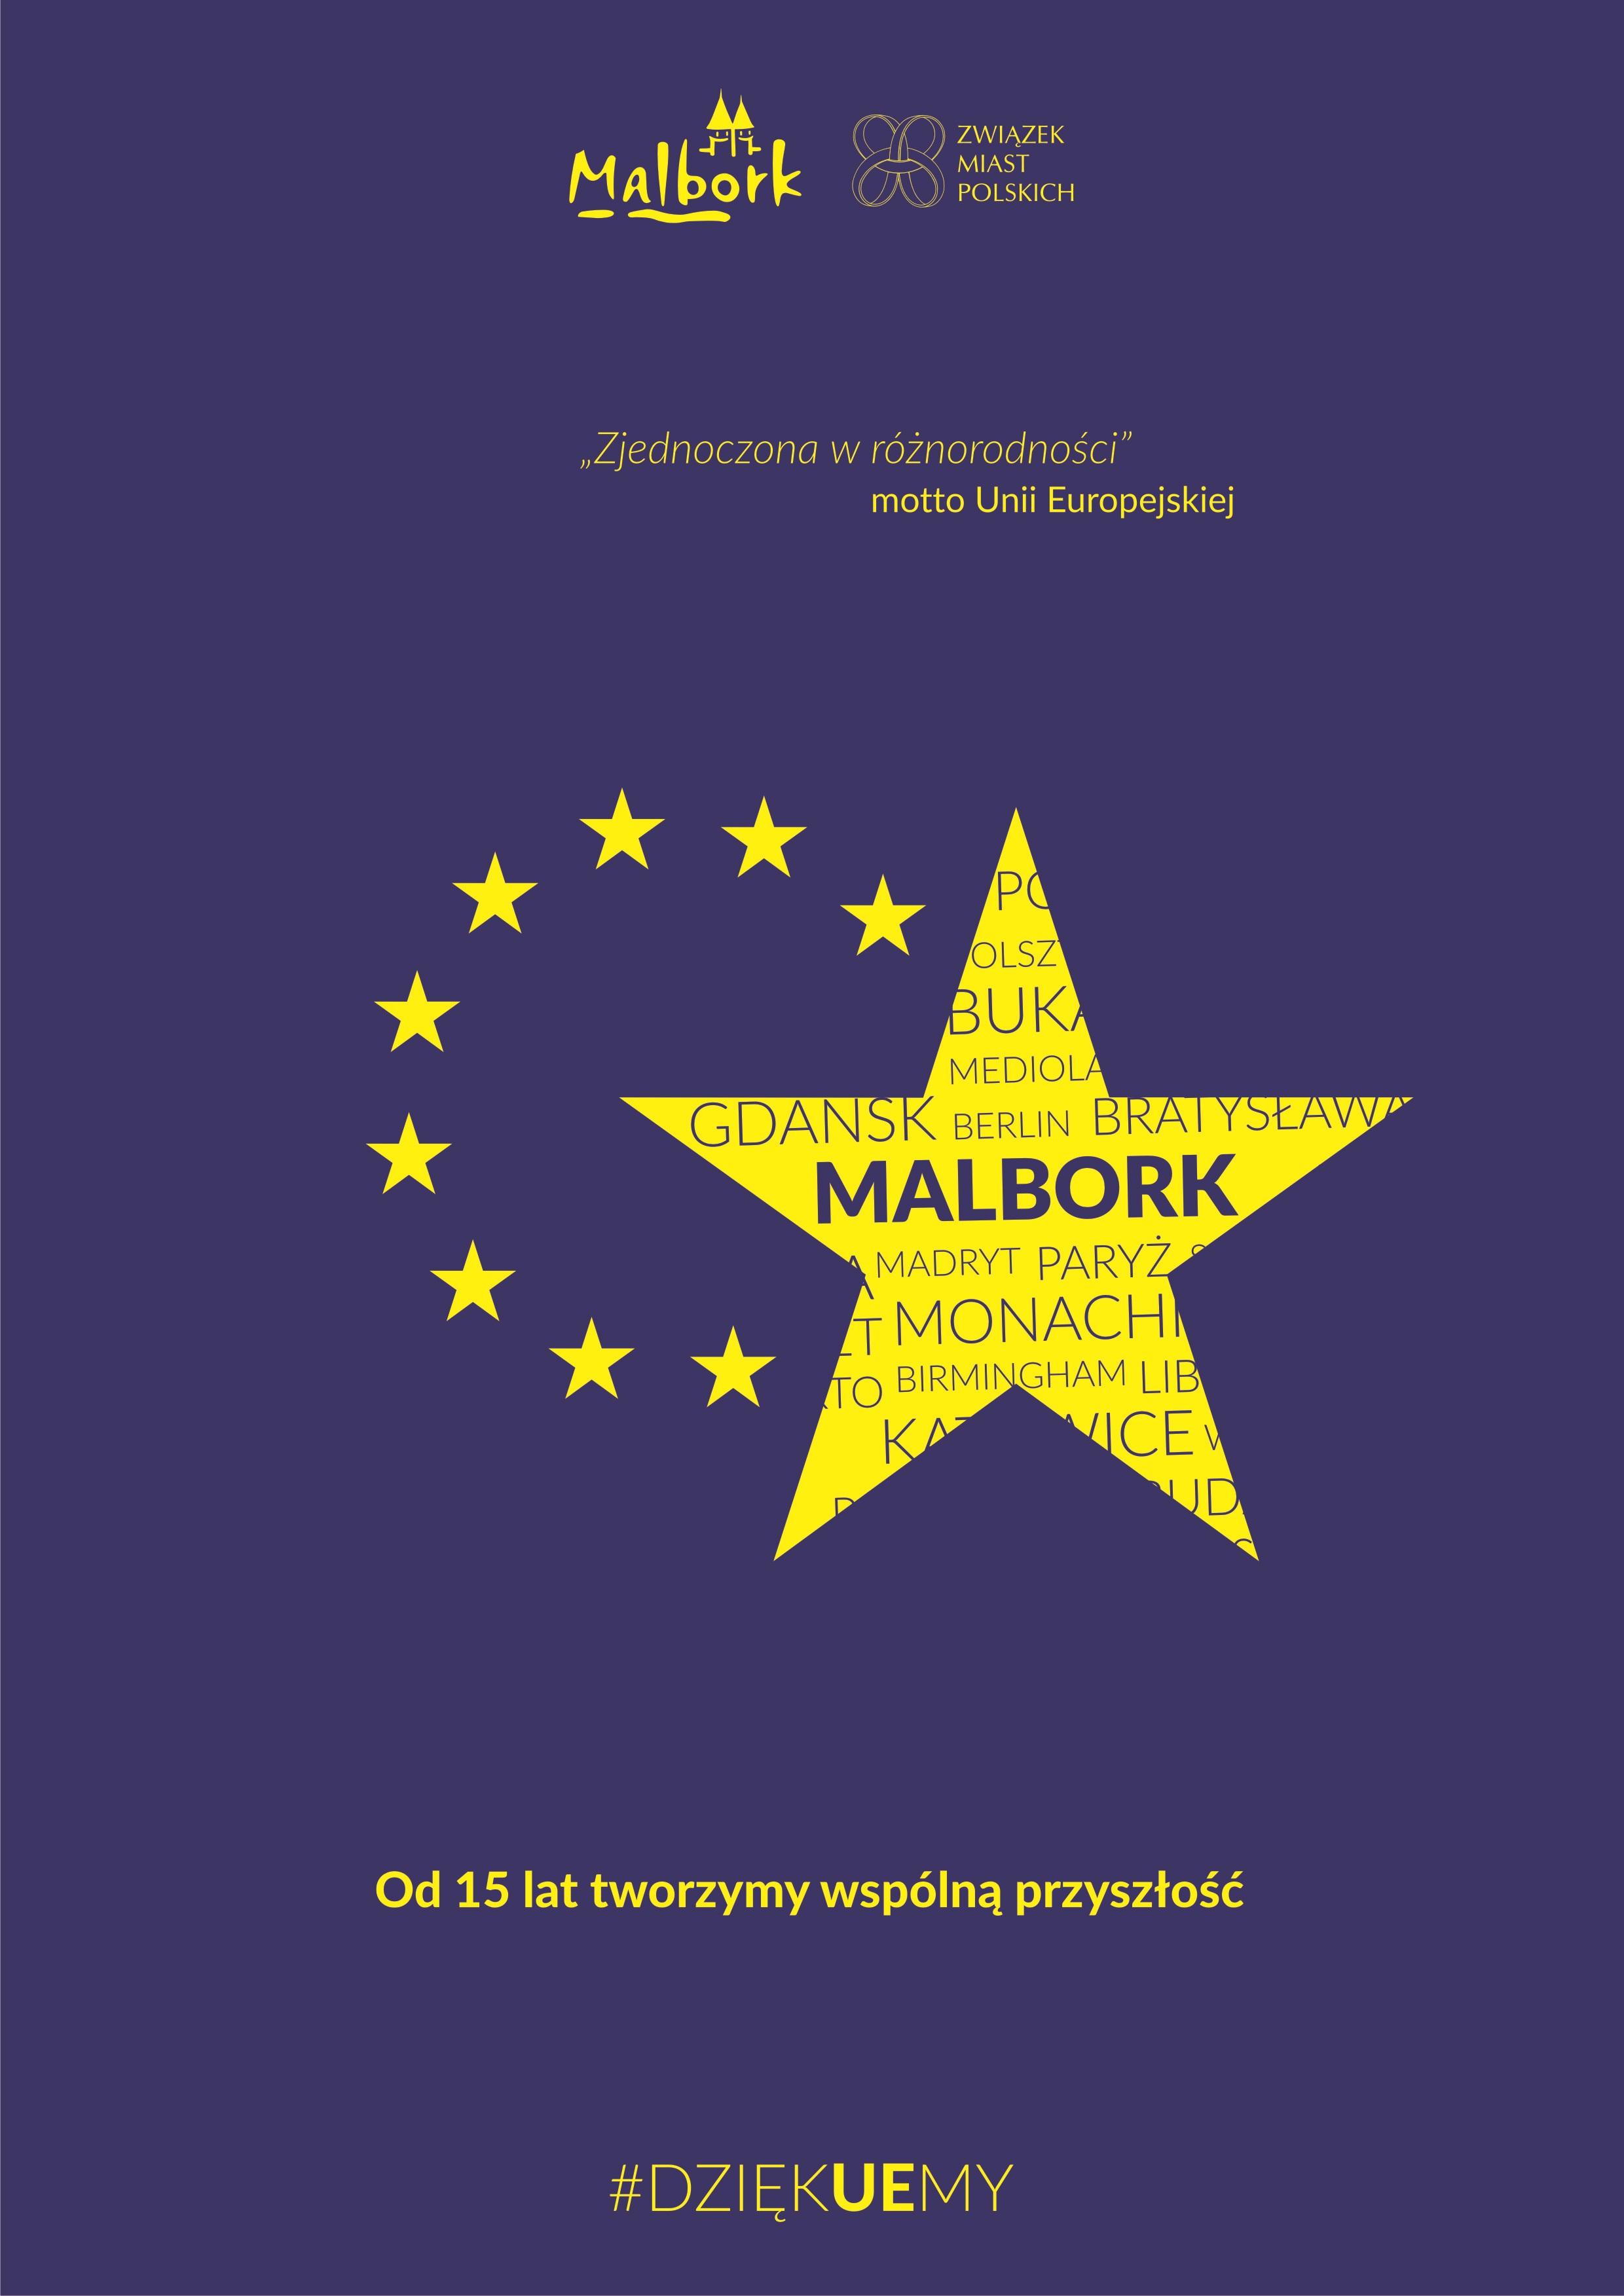 http://m.82-200.pl/2019/04/orig/malbork-w-ue-4483.jpg